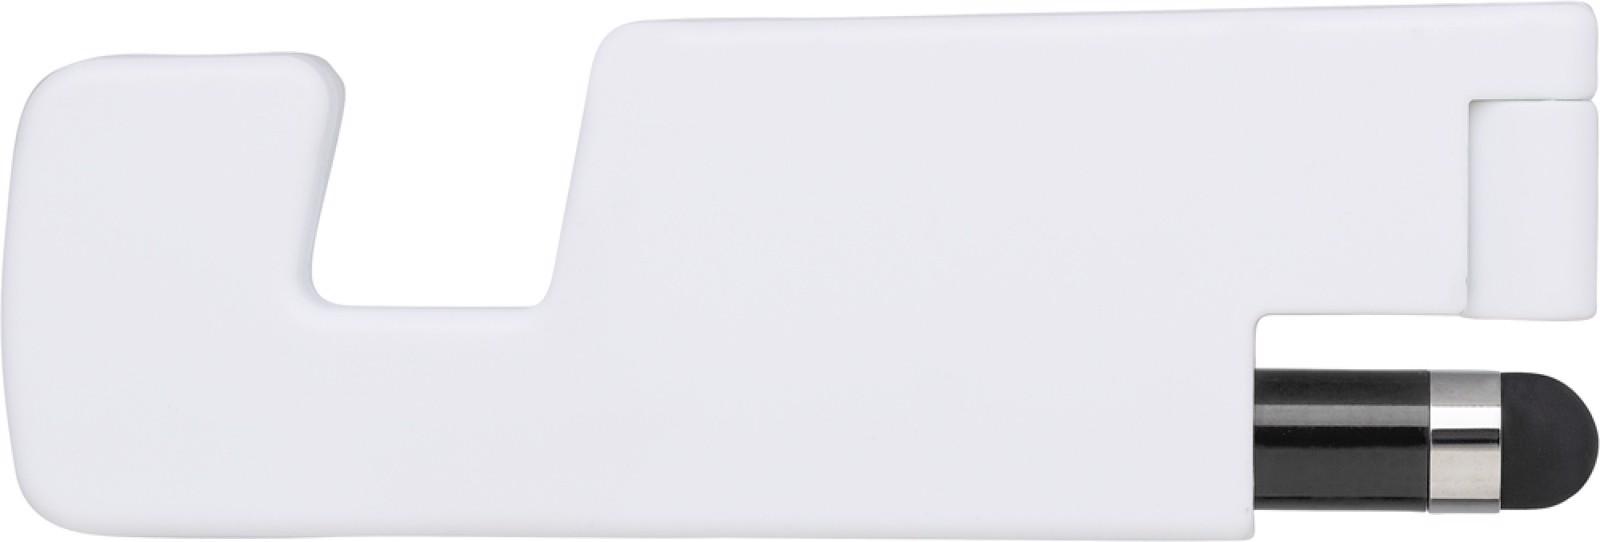 Plastic foldable mobile phone holder - Black